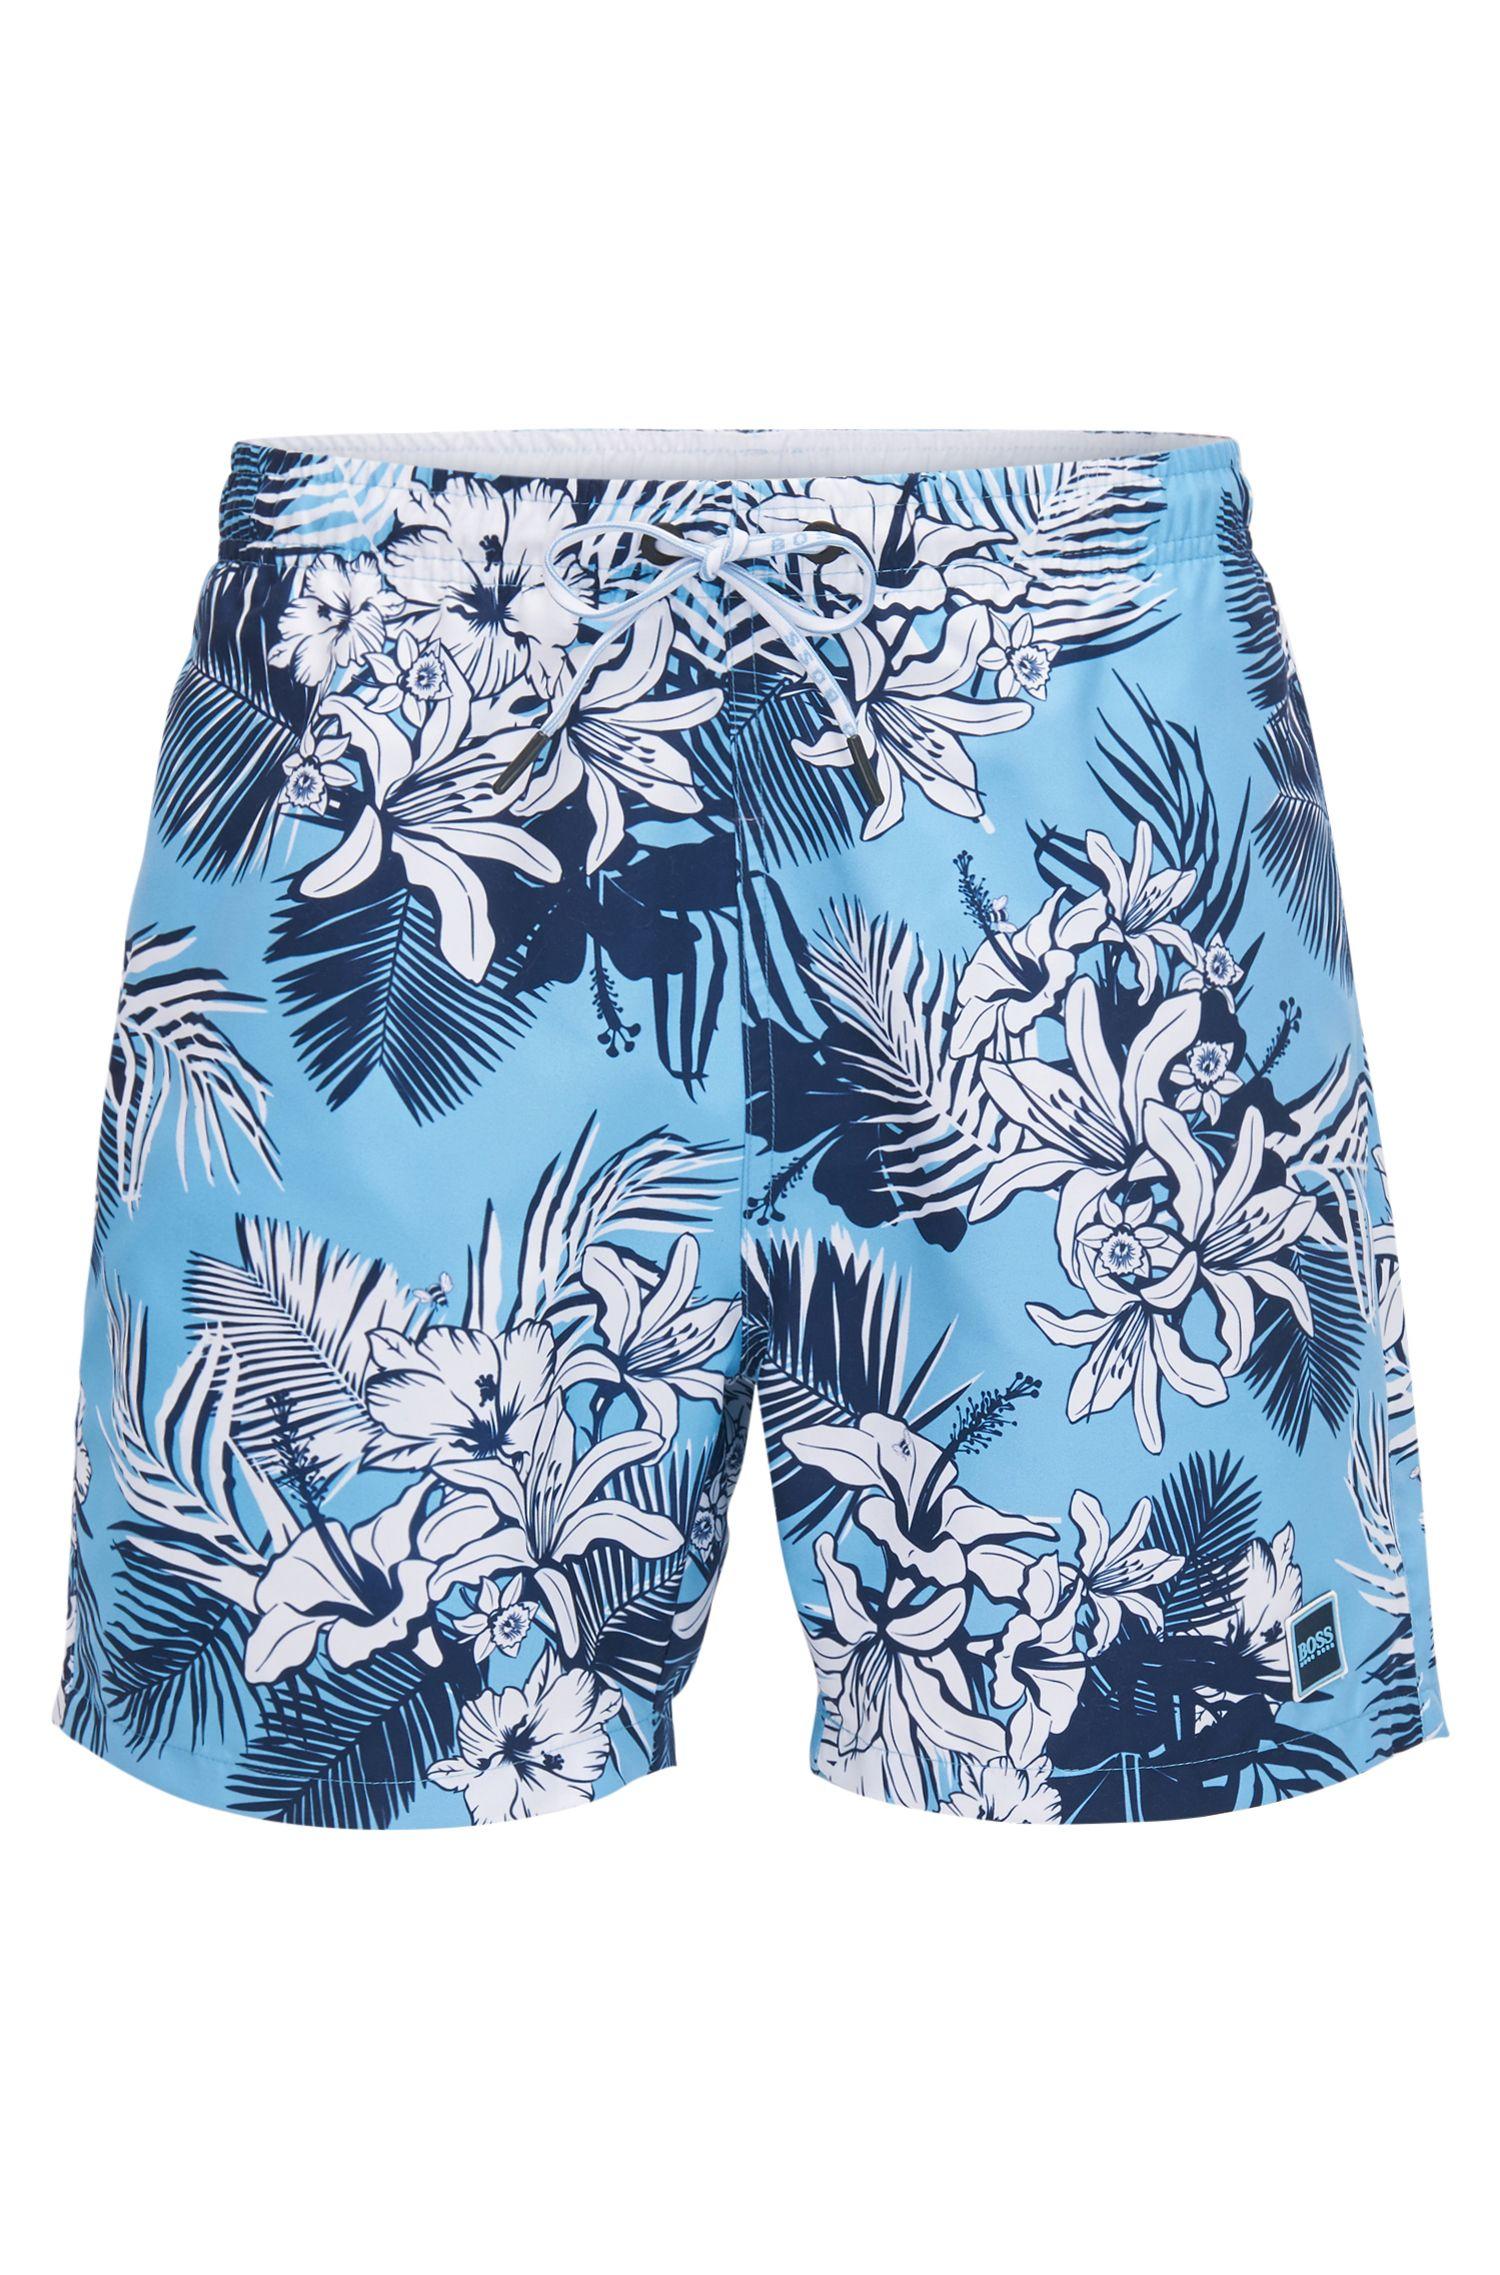 Drawstring swim shorts with palm print